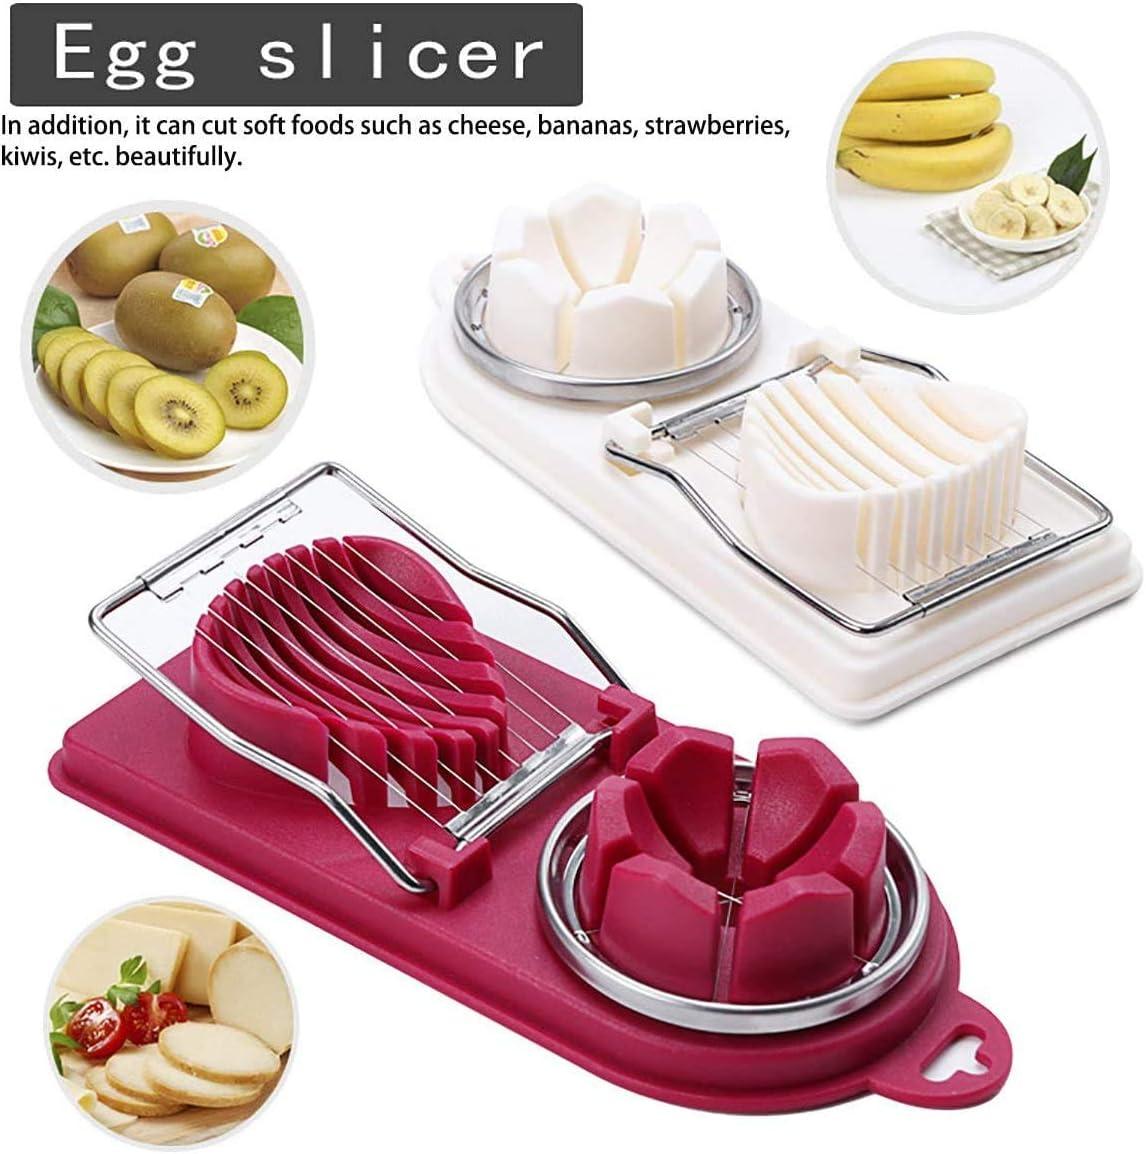 Stainless Steel Wire Egg Slicer Cutter Chopper Kitchen Tool Gadget Utensil